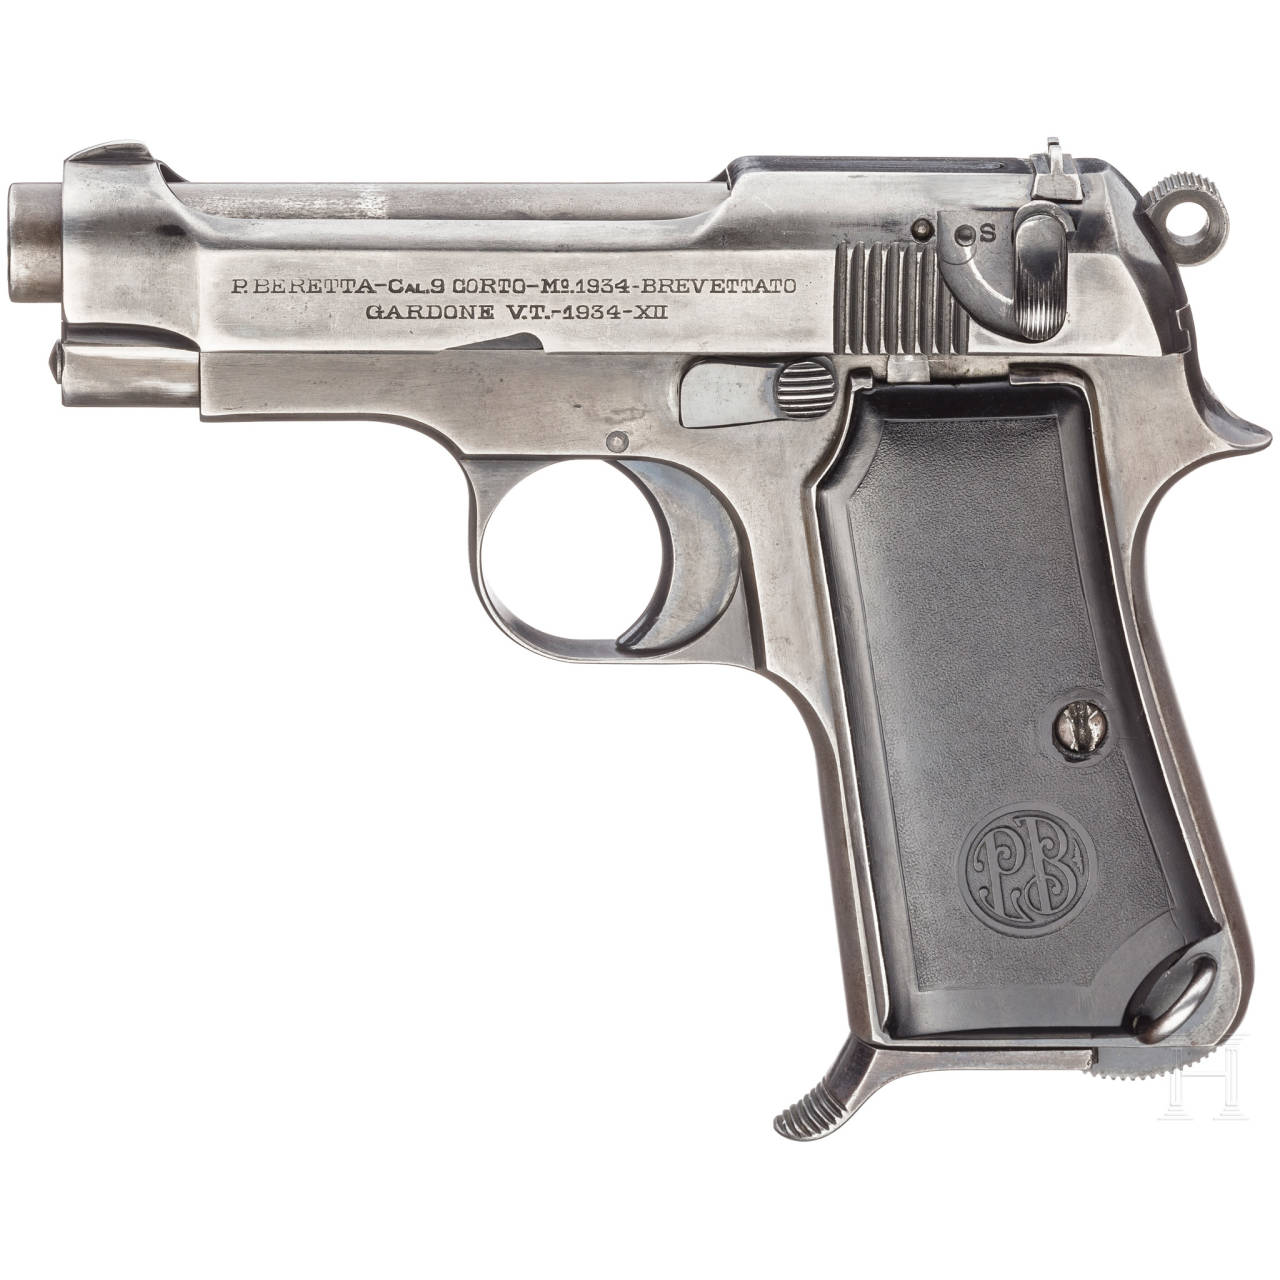 Beretta Mod. 34, Prototyp-Versuch